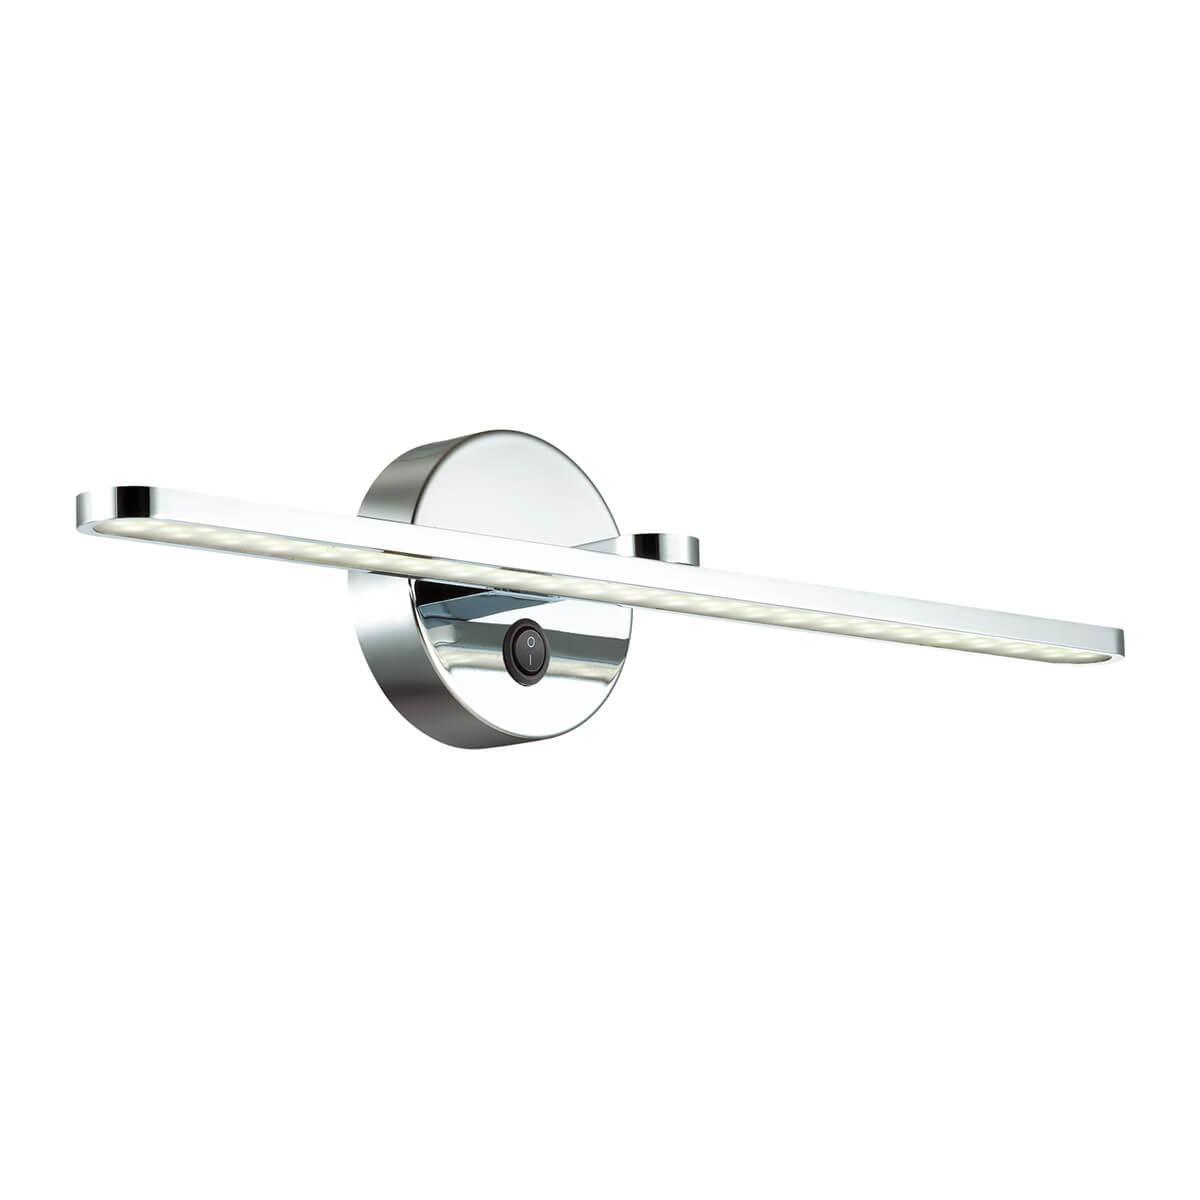 Подсветка для зеркал Lumion 3762/14WL Picture